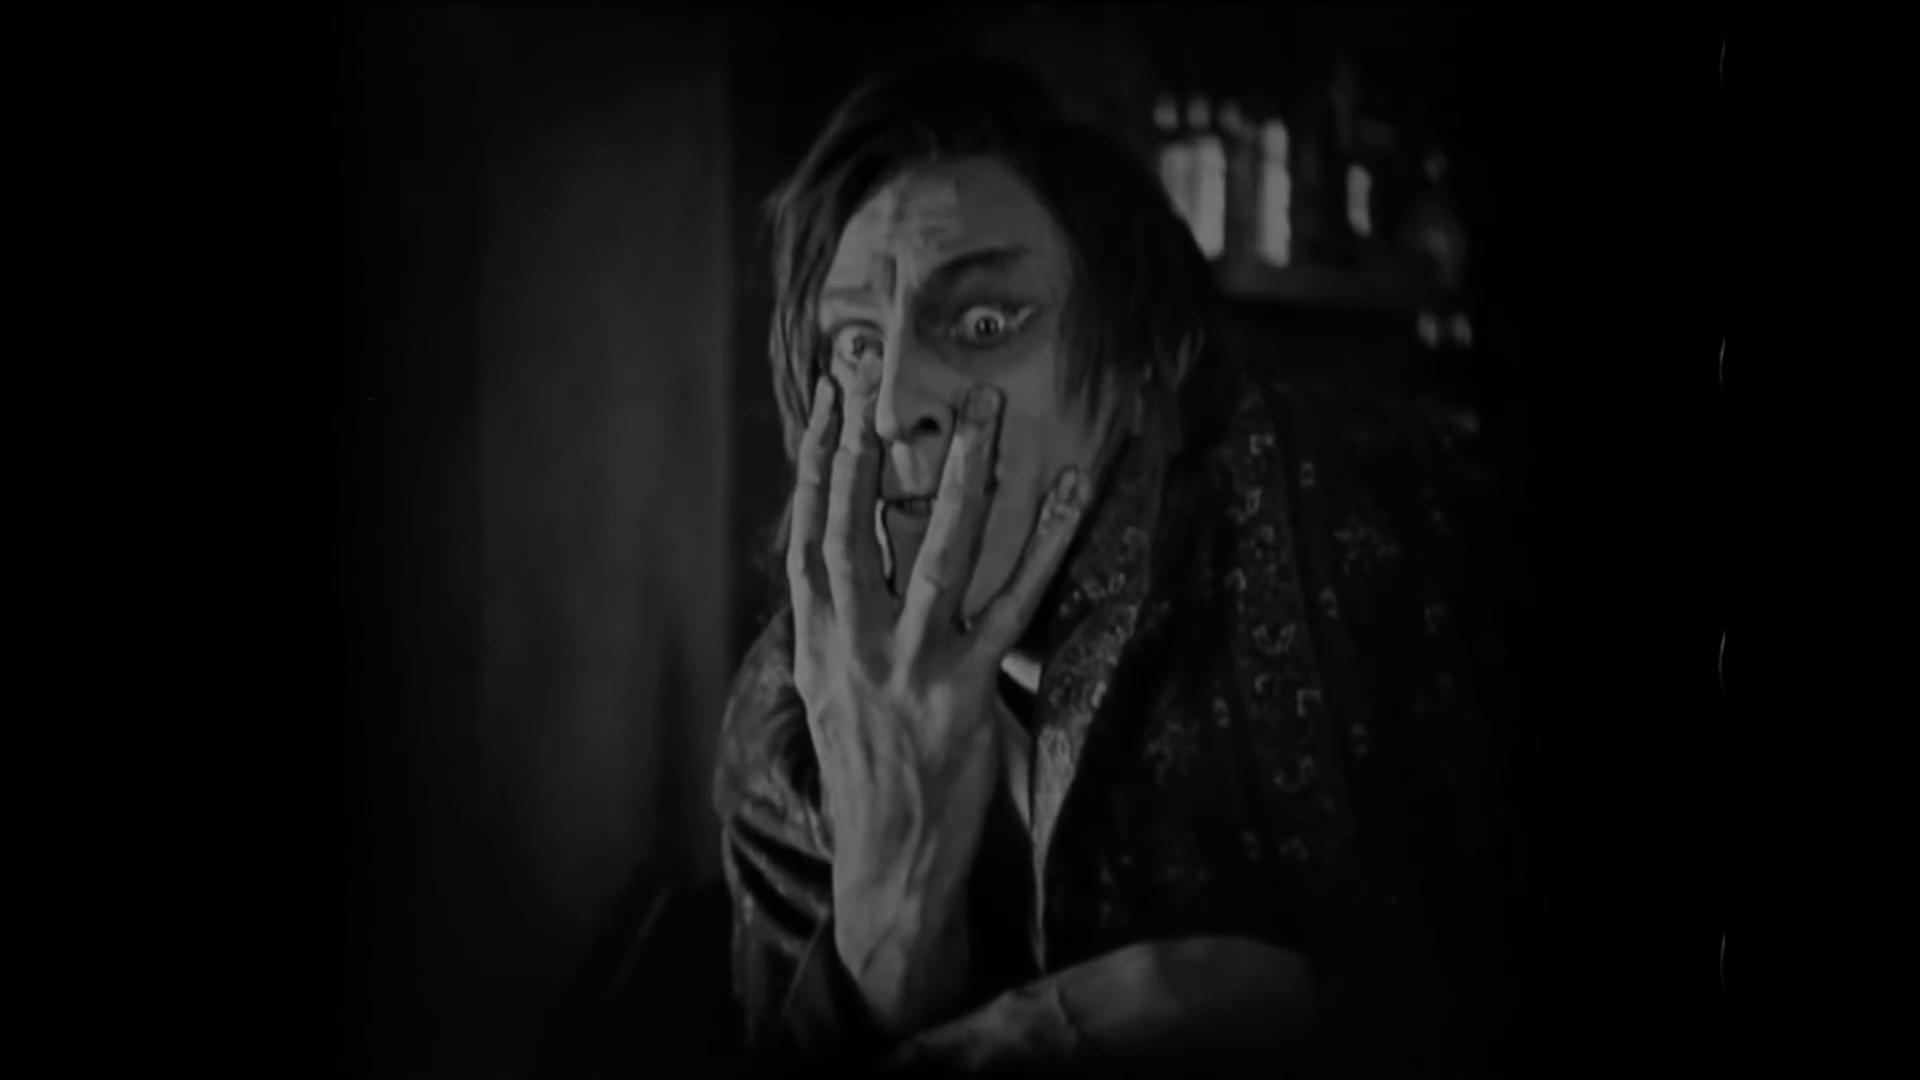 John Barrymore est Hyde dans Dr. Jekyll and Mr. Hyde (Docteur Jekyll et M. Hyde, 1920) de John S. Robertson